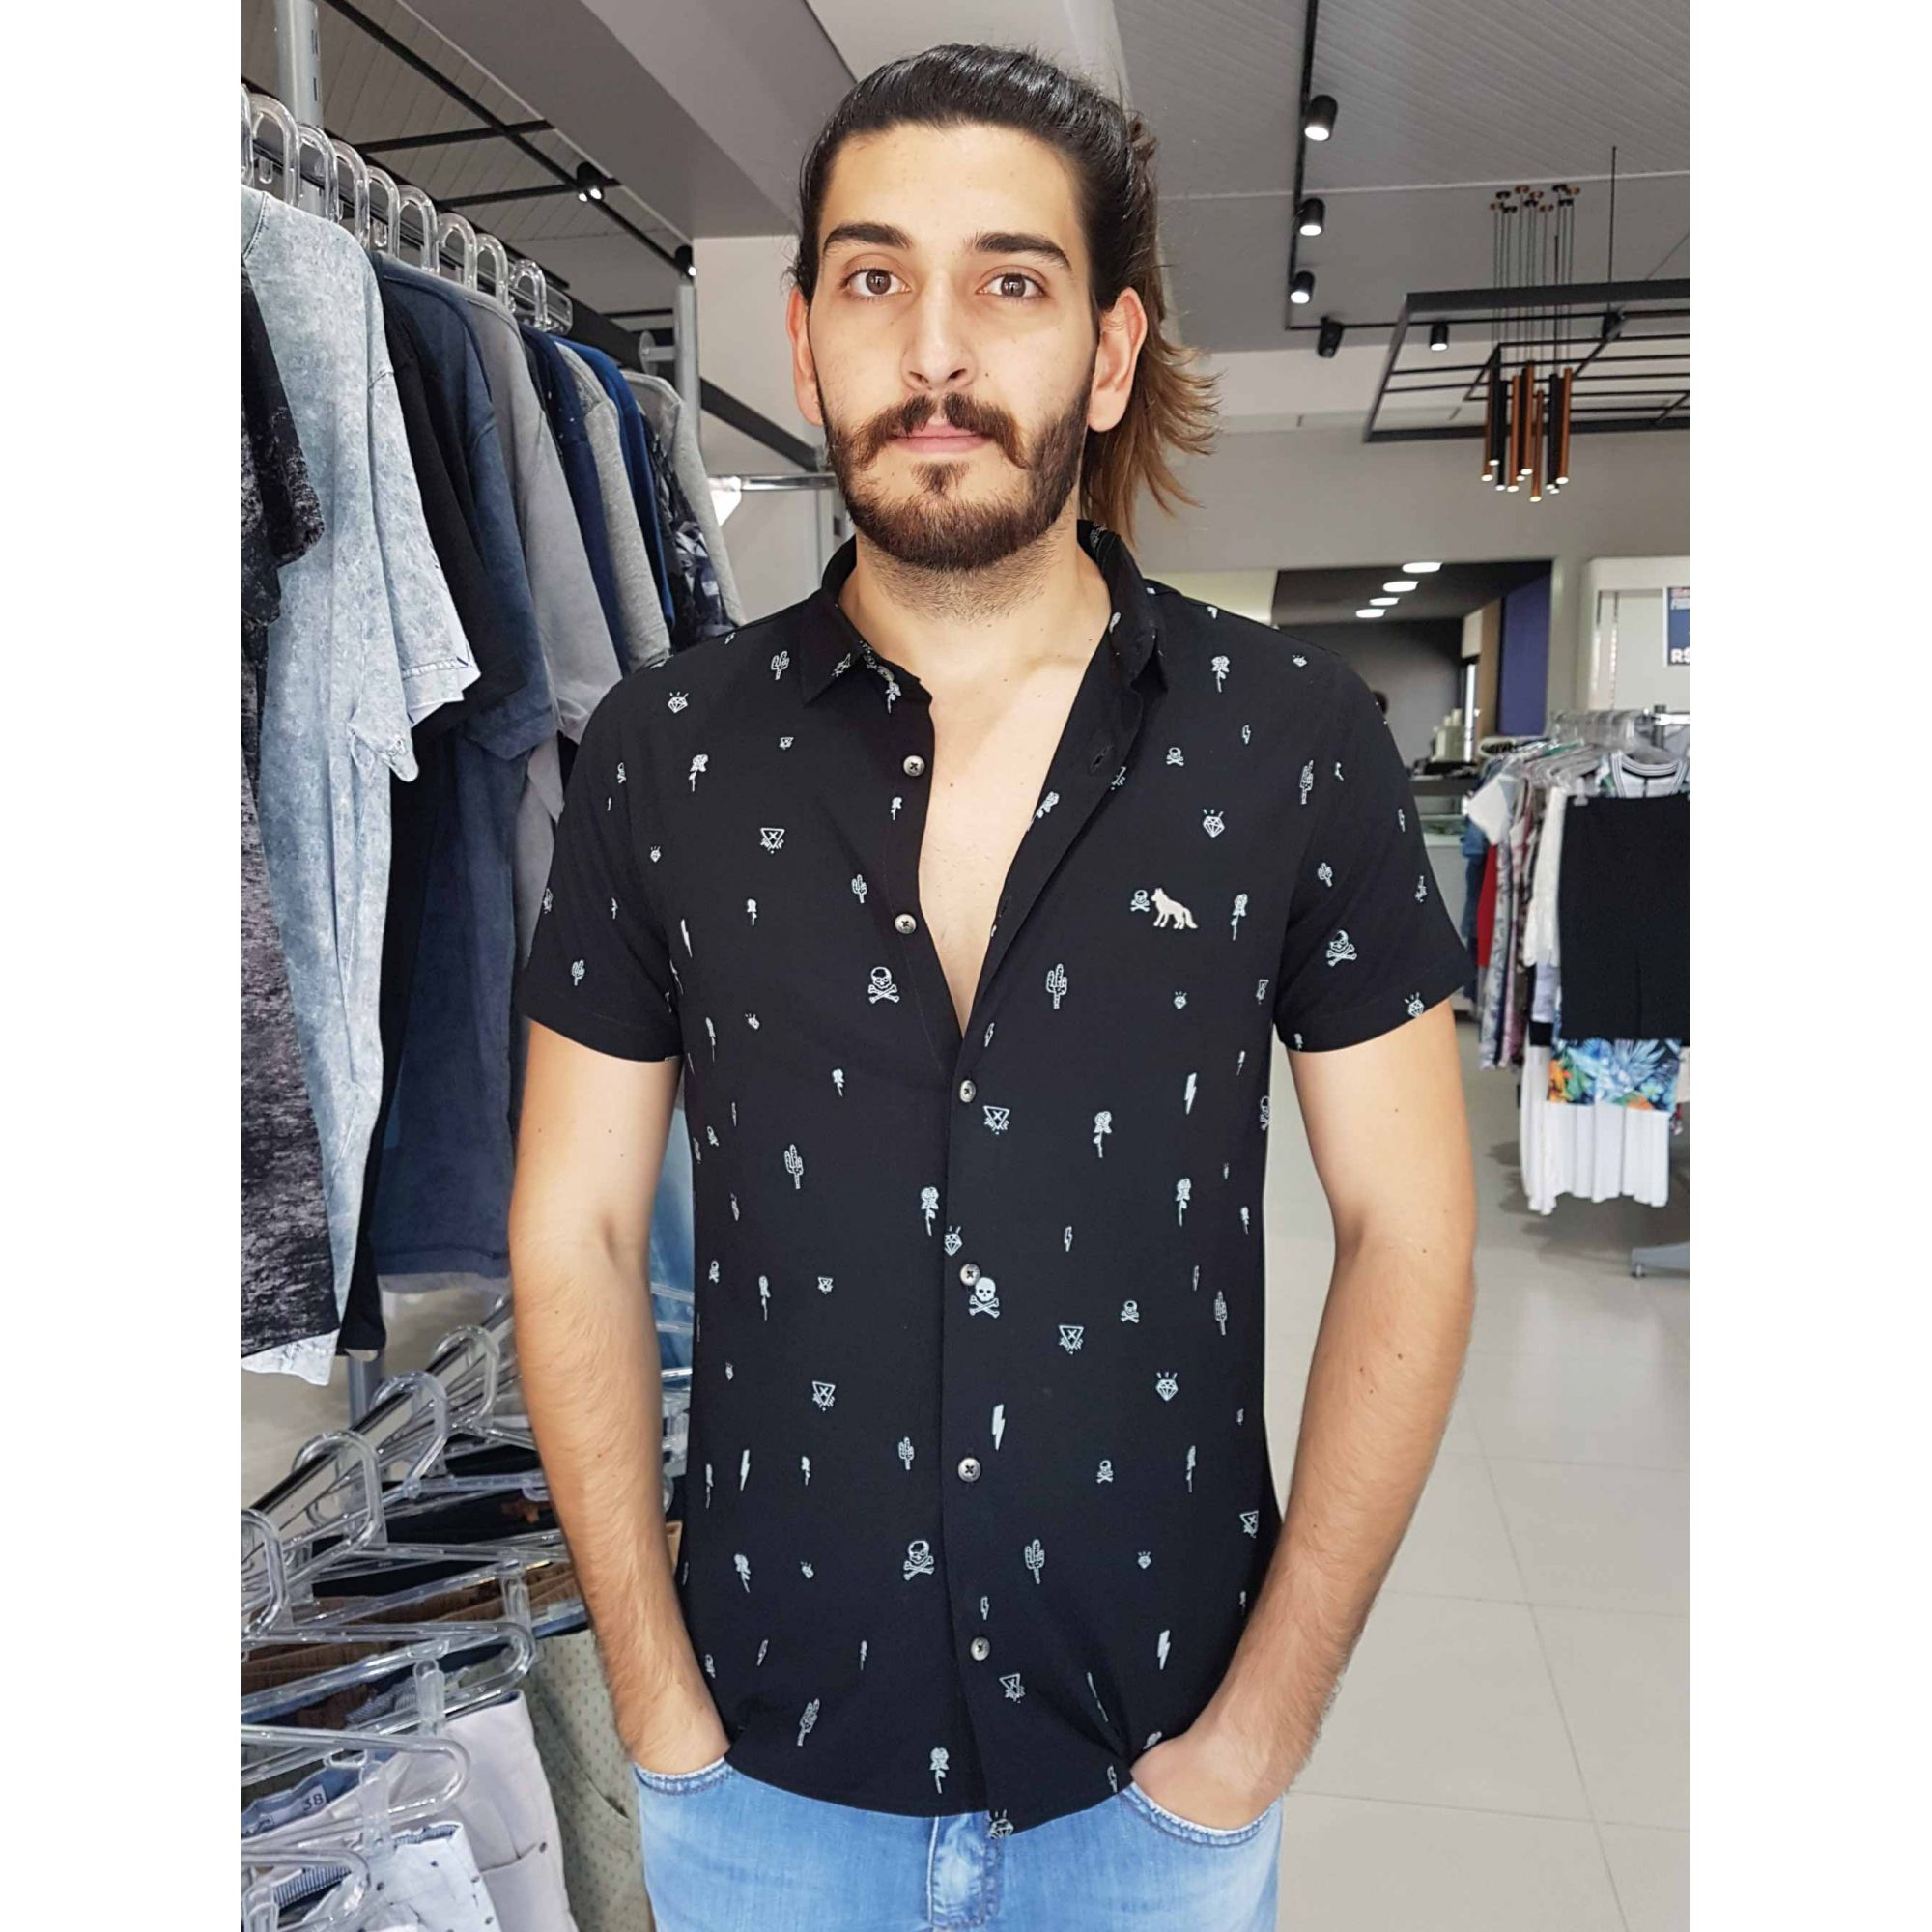 Camisa Acostamento Masculina Social Manga Curta Preta